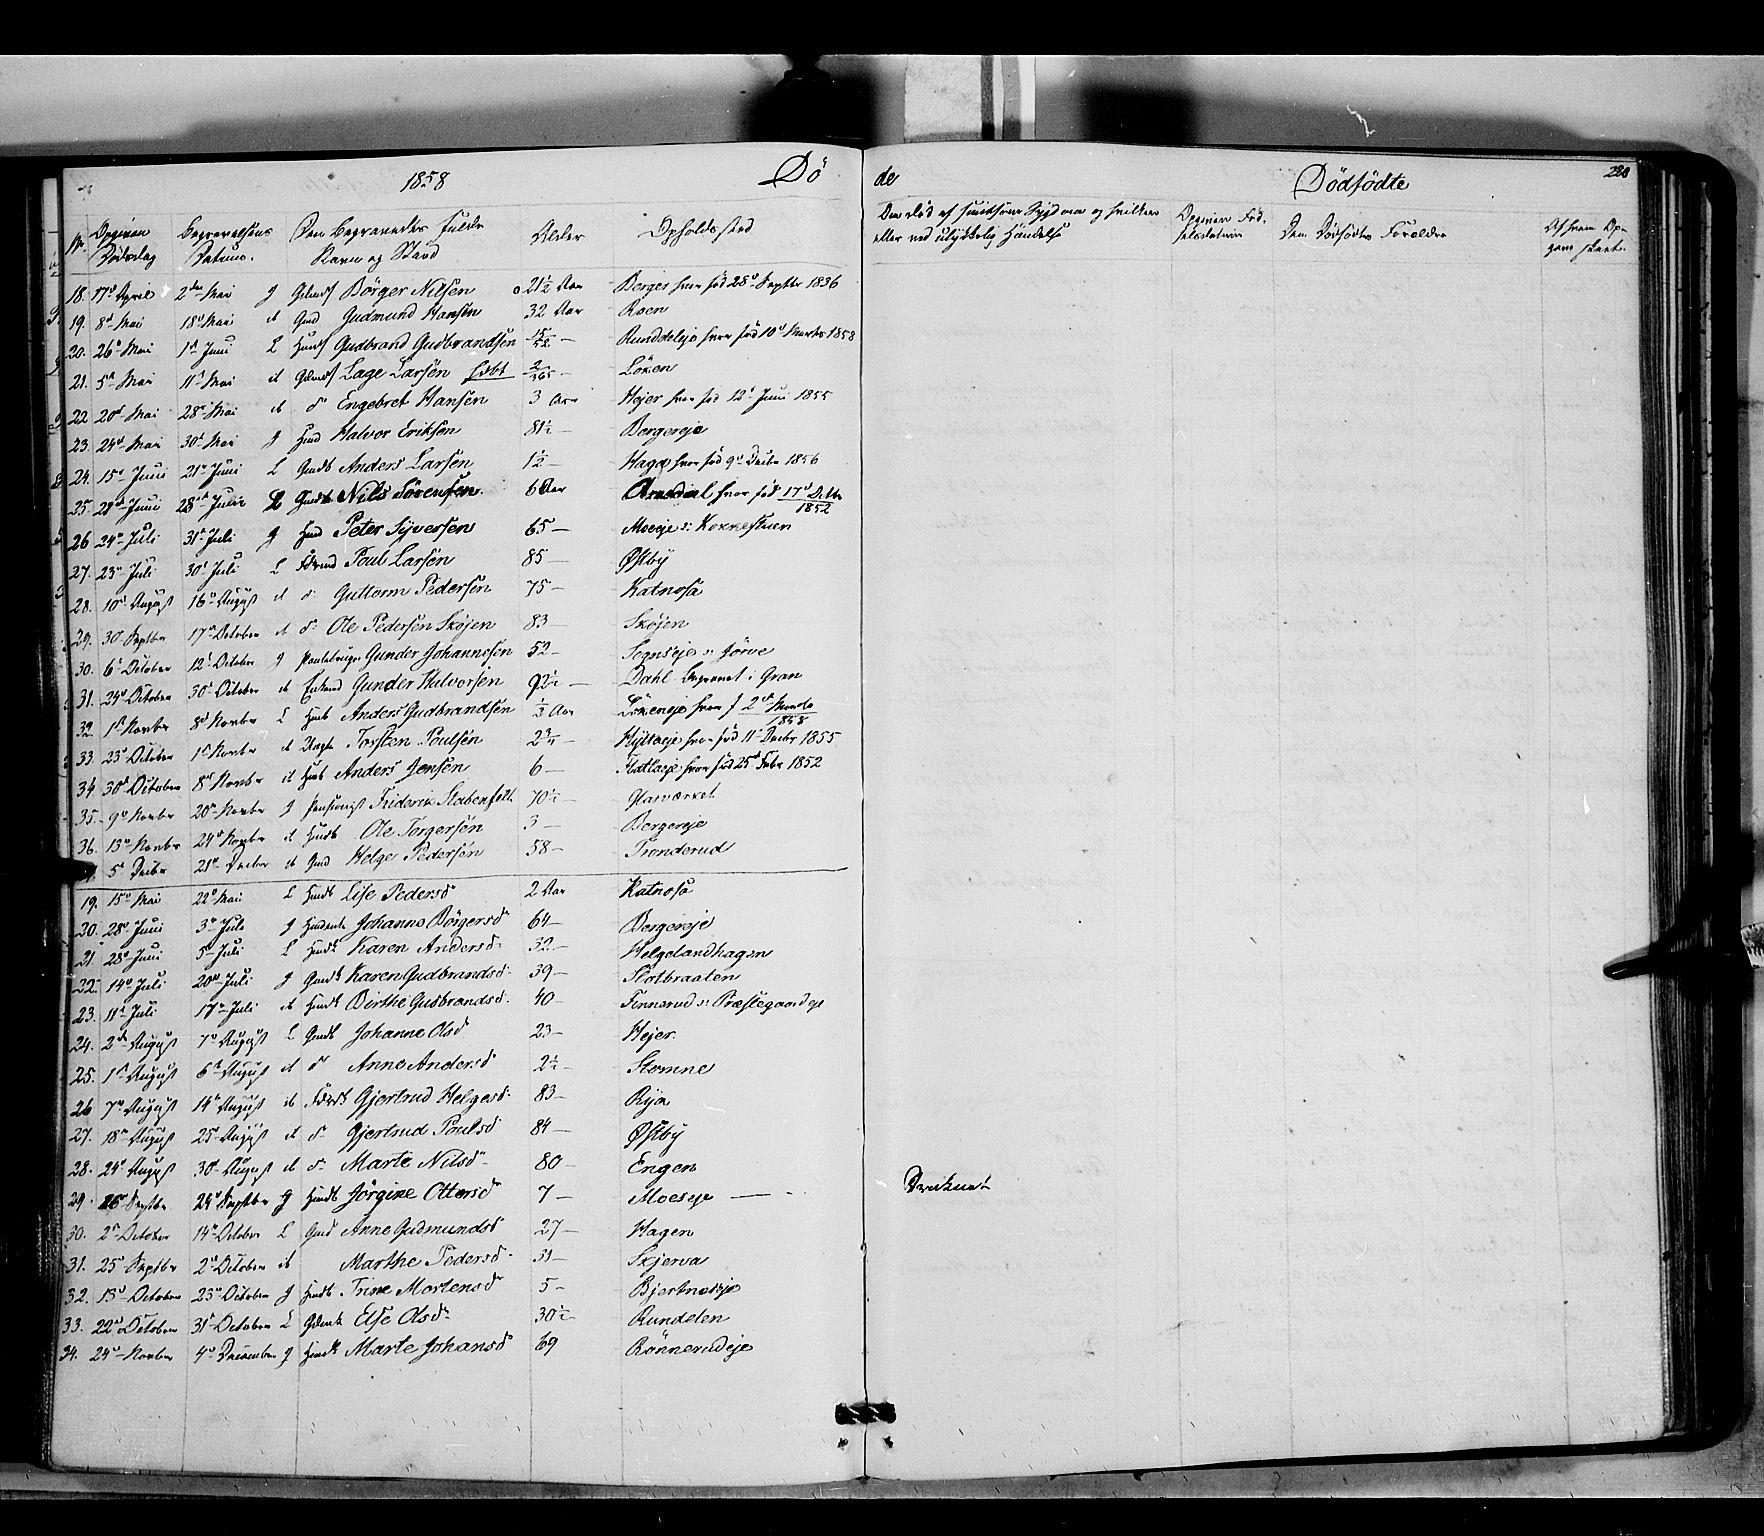 SAH, Jevnaker prestekontor, Ministerialbok nr. 7, 1858-1876, s. 220